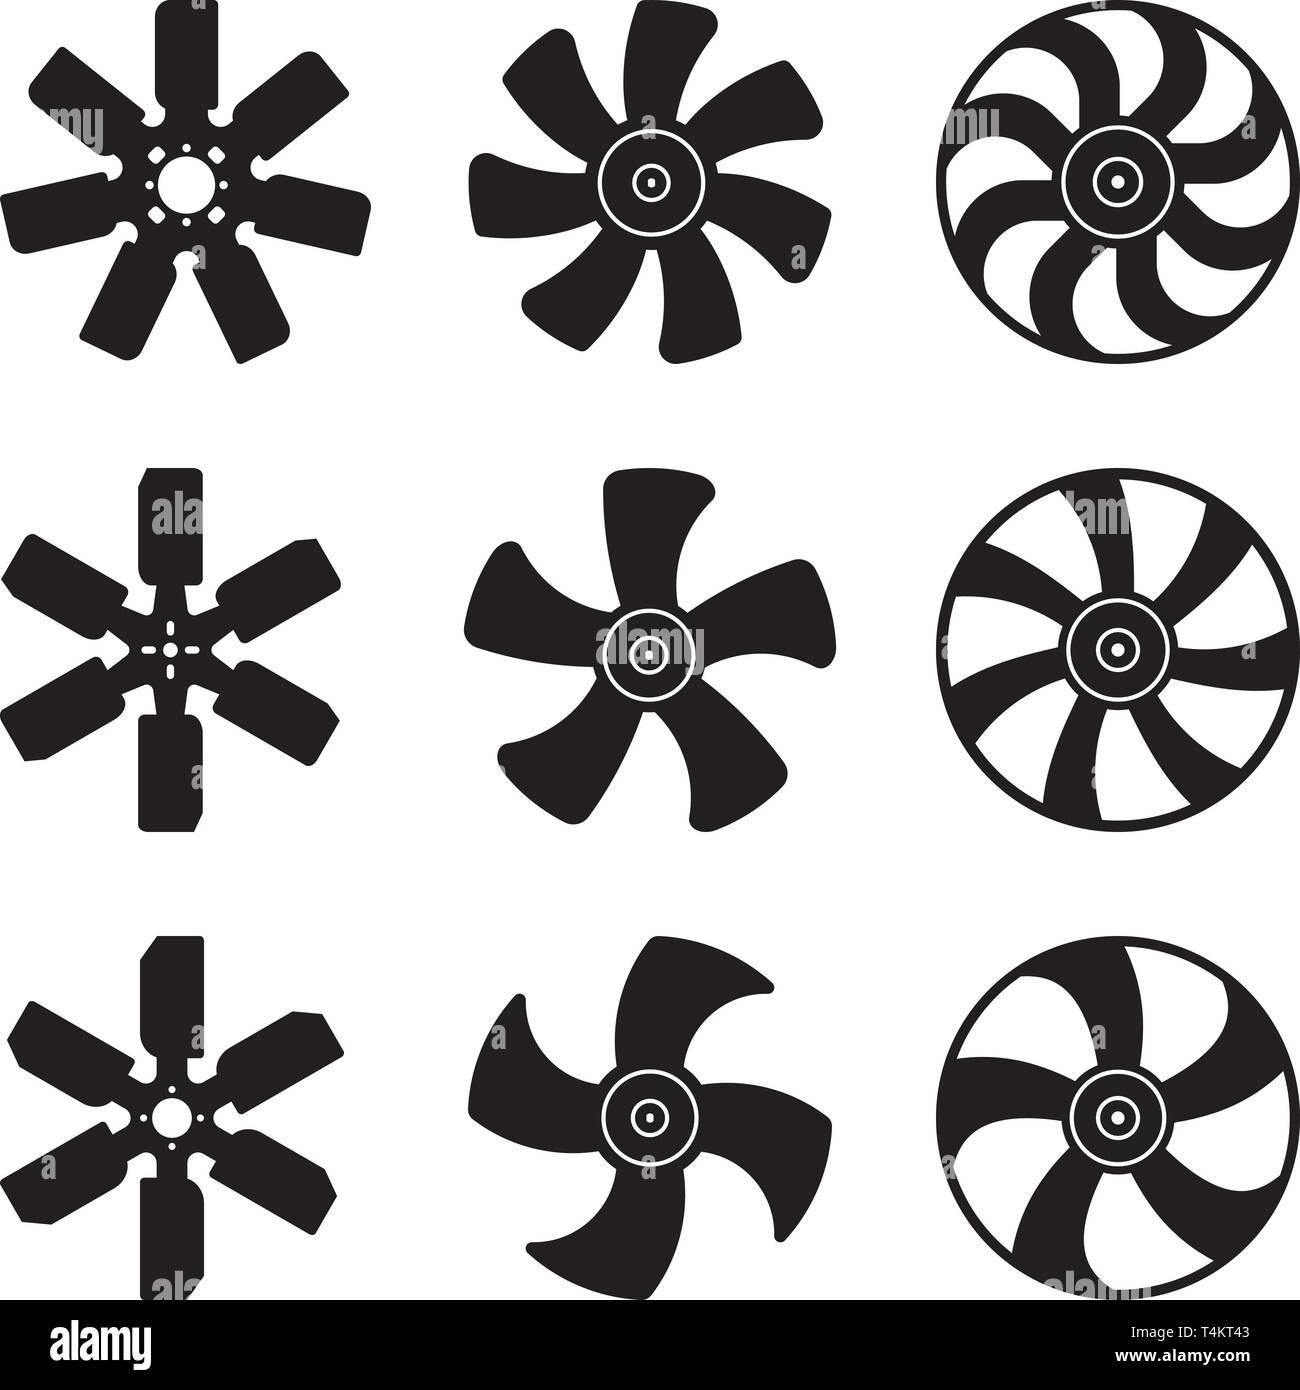 Kühler Lüfter blade Symbole gesetzt. Auto Teile. Silhouette Vektor Stockbild